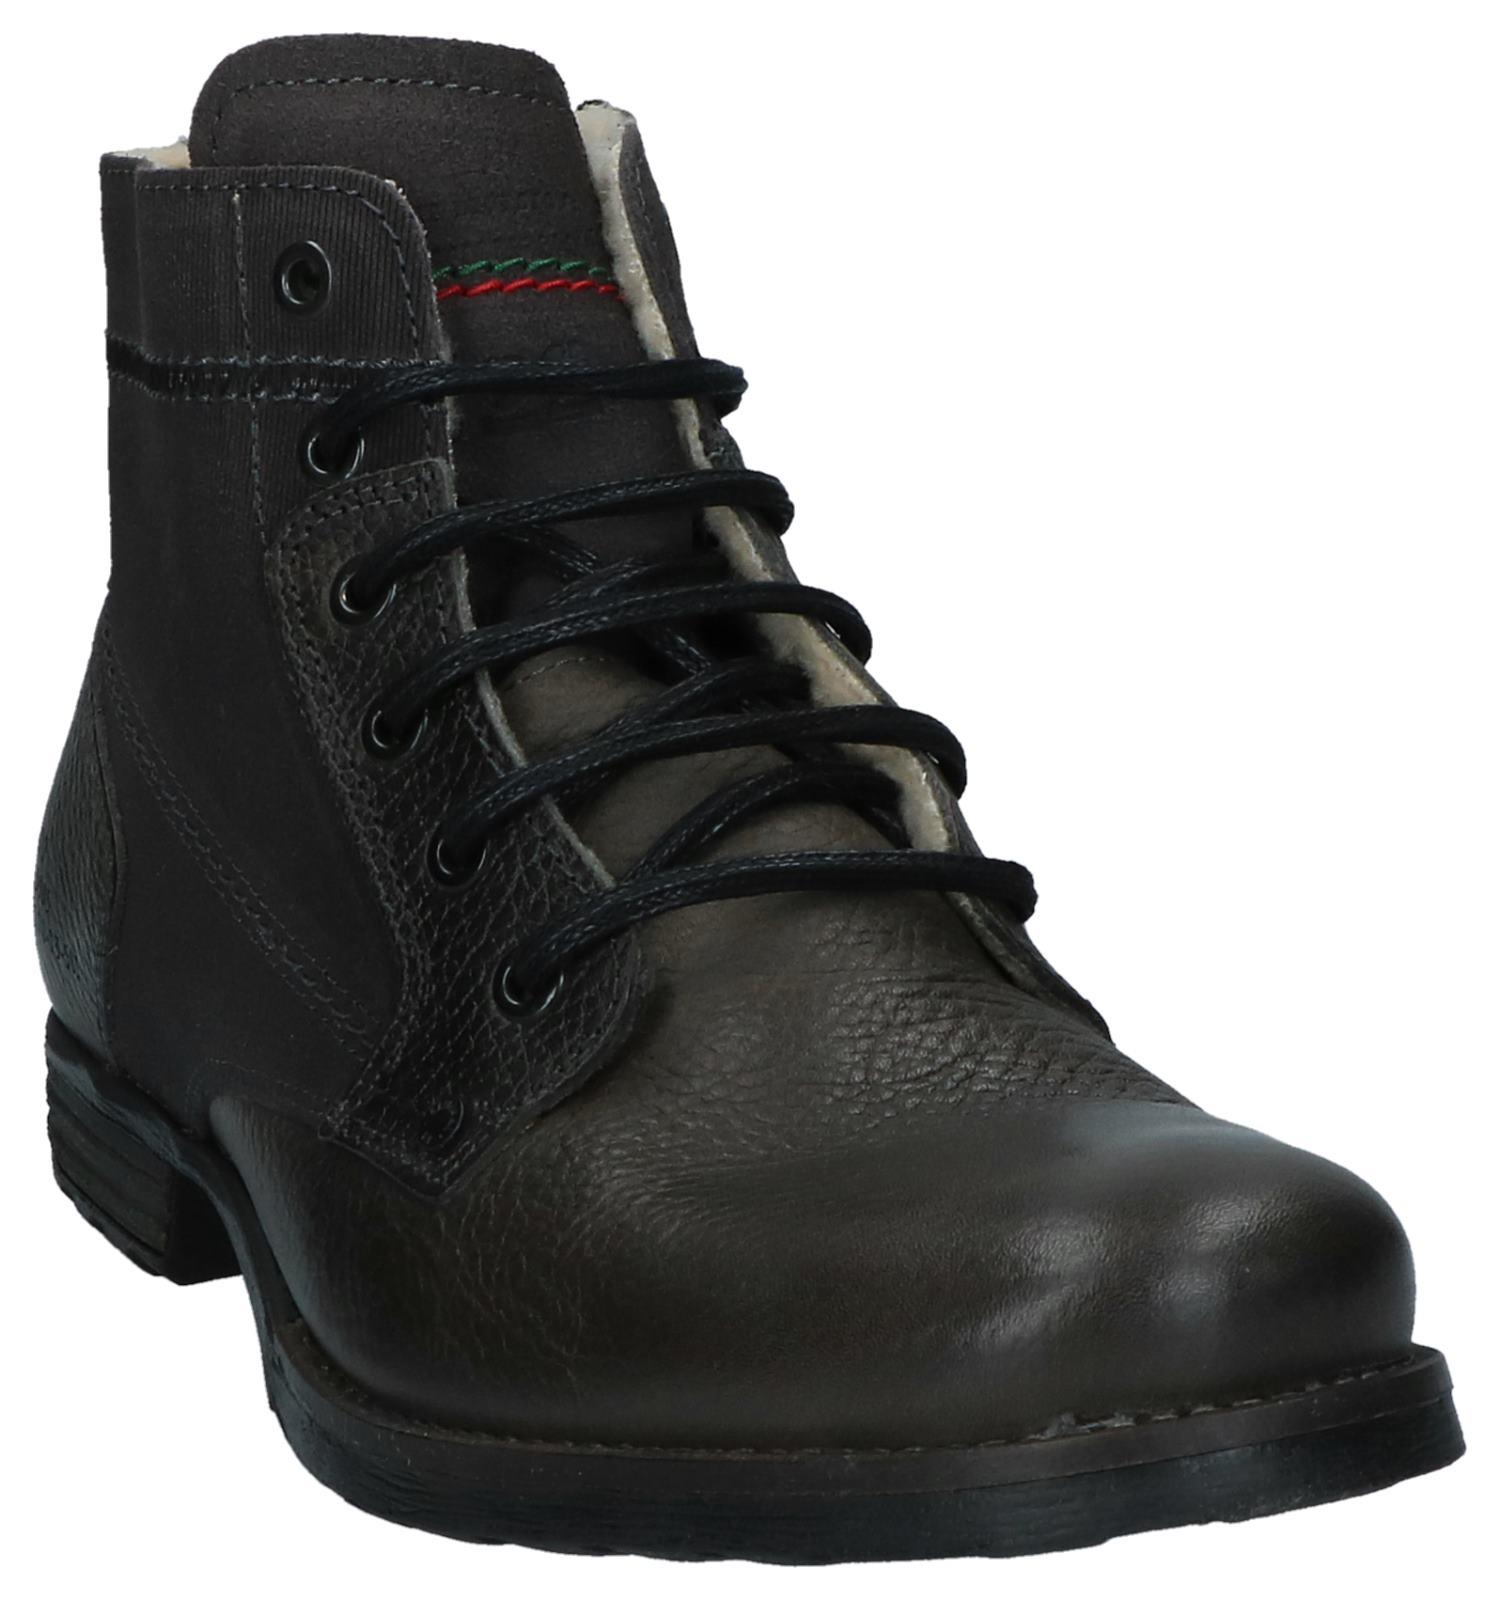 Grijze Bullboxer Boots Met Rits veter Donker 5LRj4A